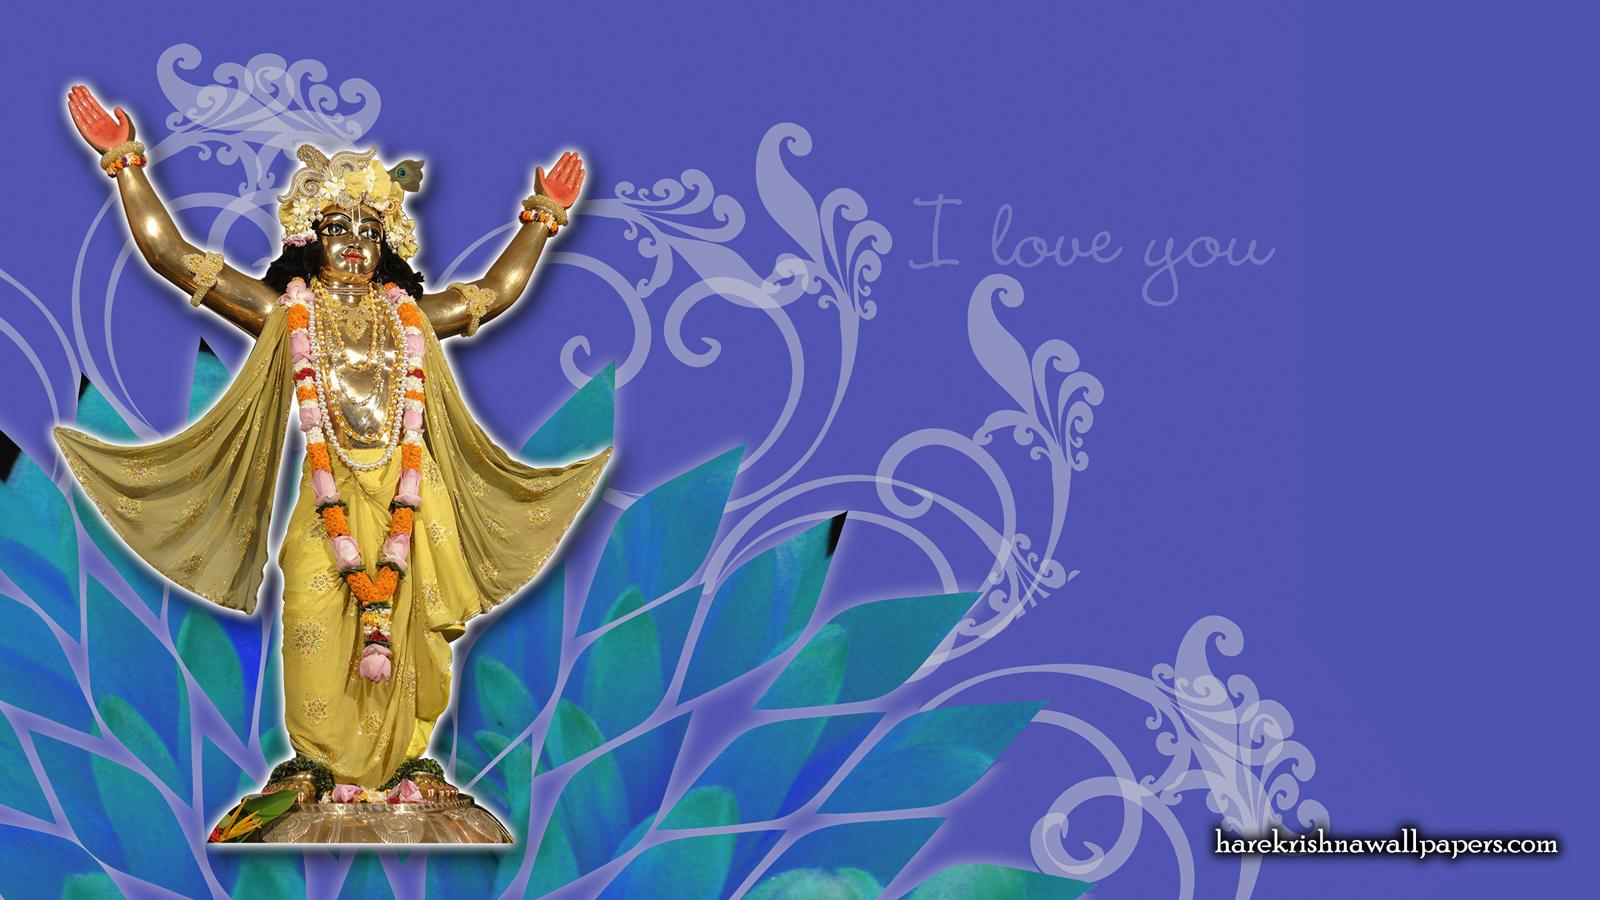 Chaitanya Mahaprabhu Wallpaper (004) Size 1600x900 Download